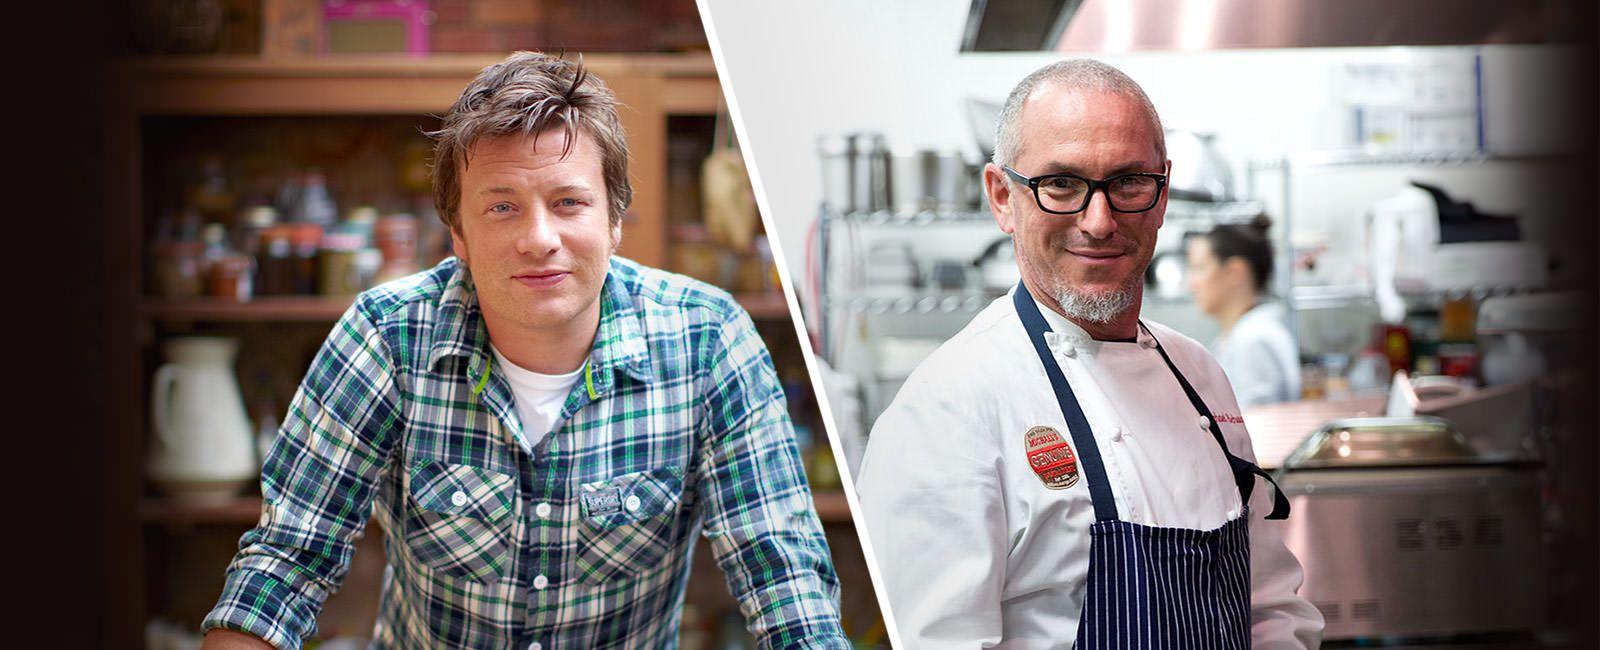 celebrity-chefs.jpg